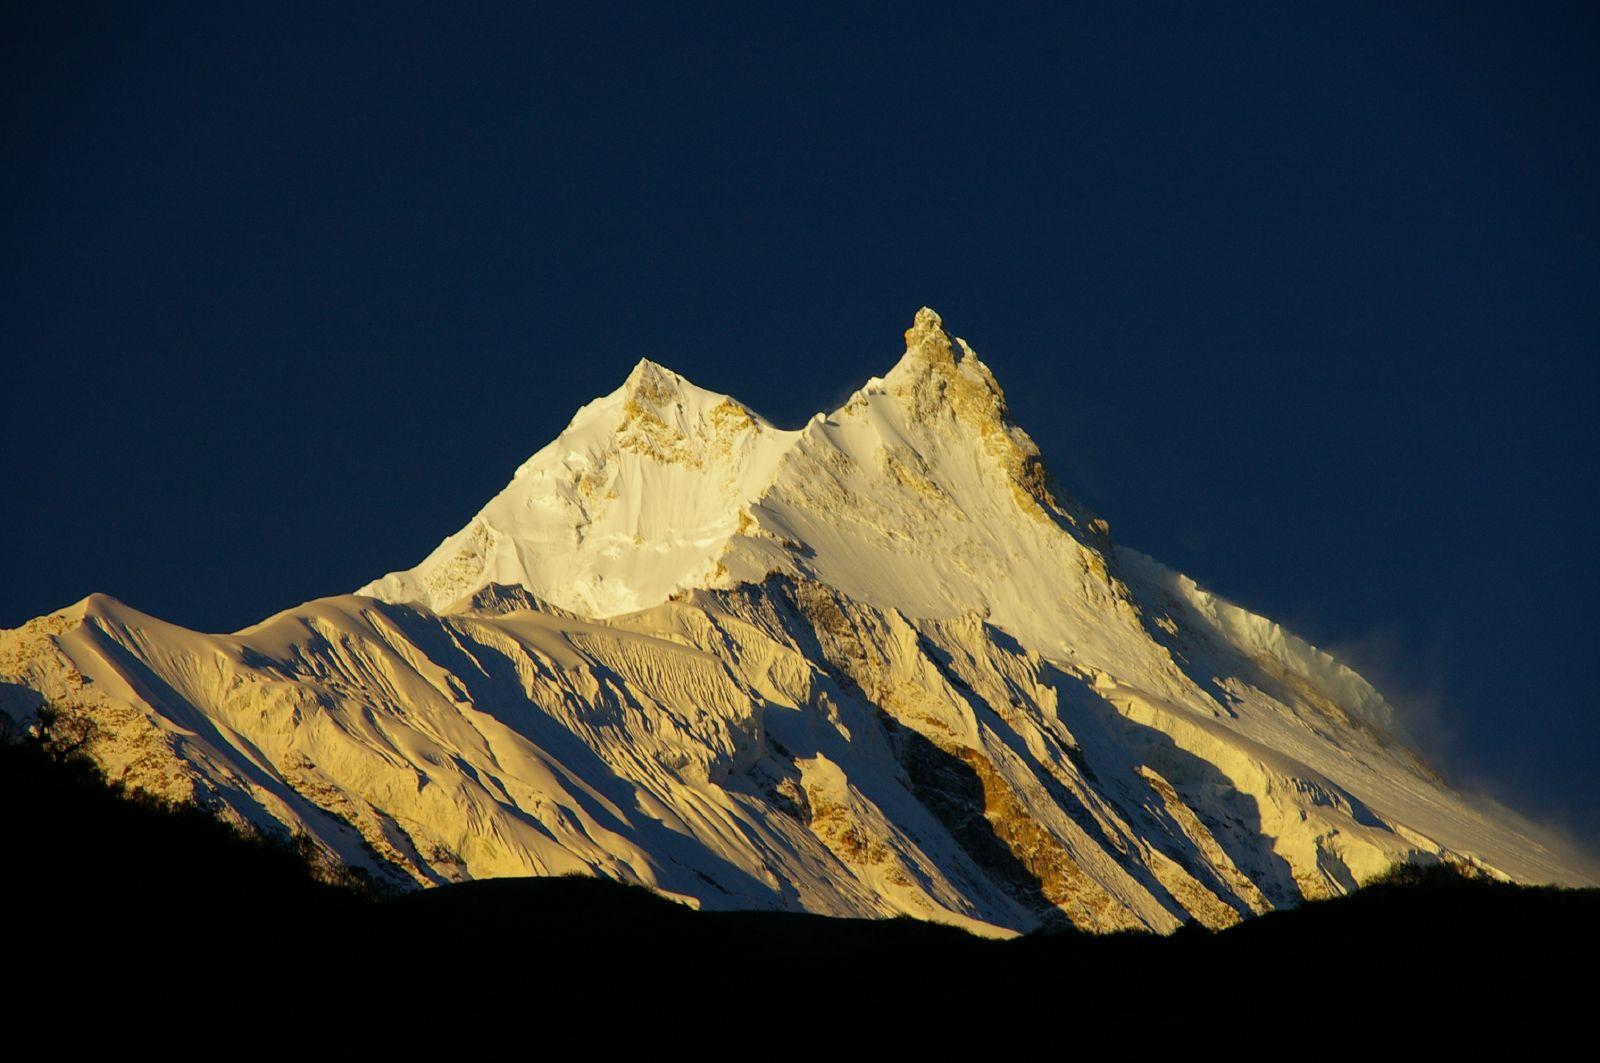 Beautiful scene of manaslu mountain